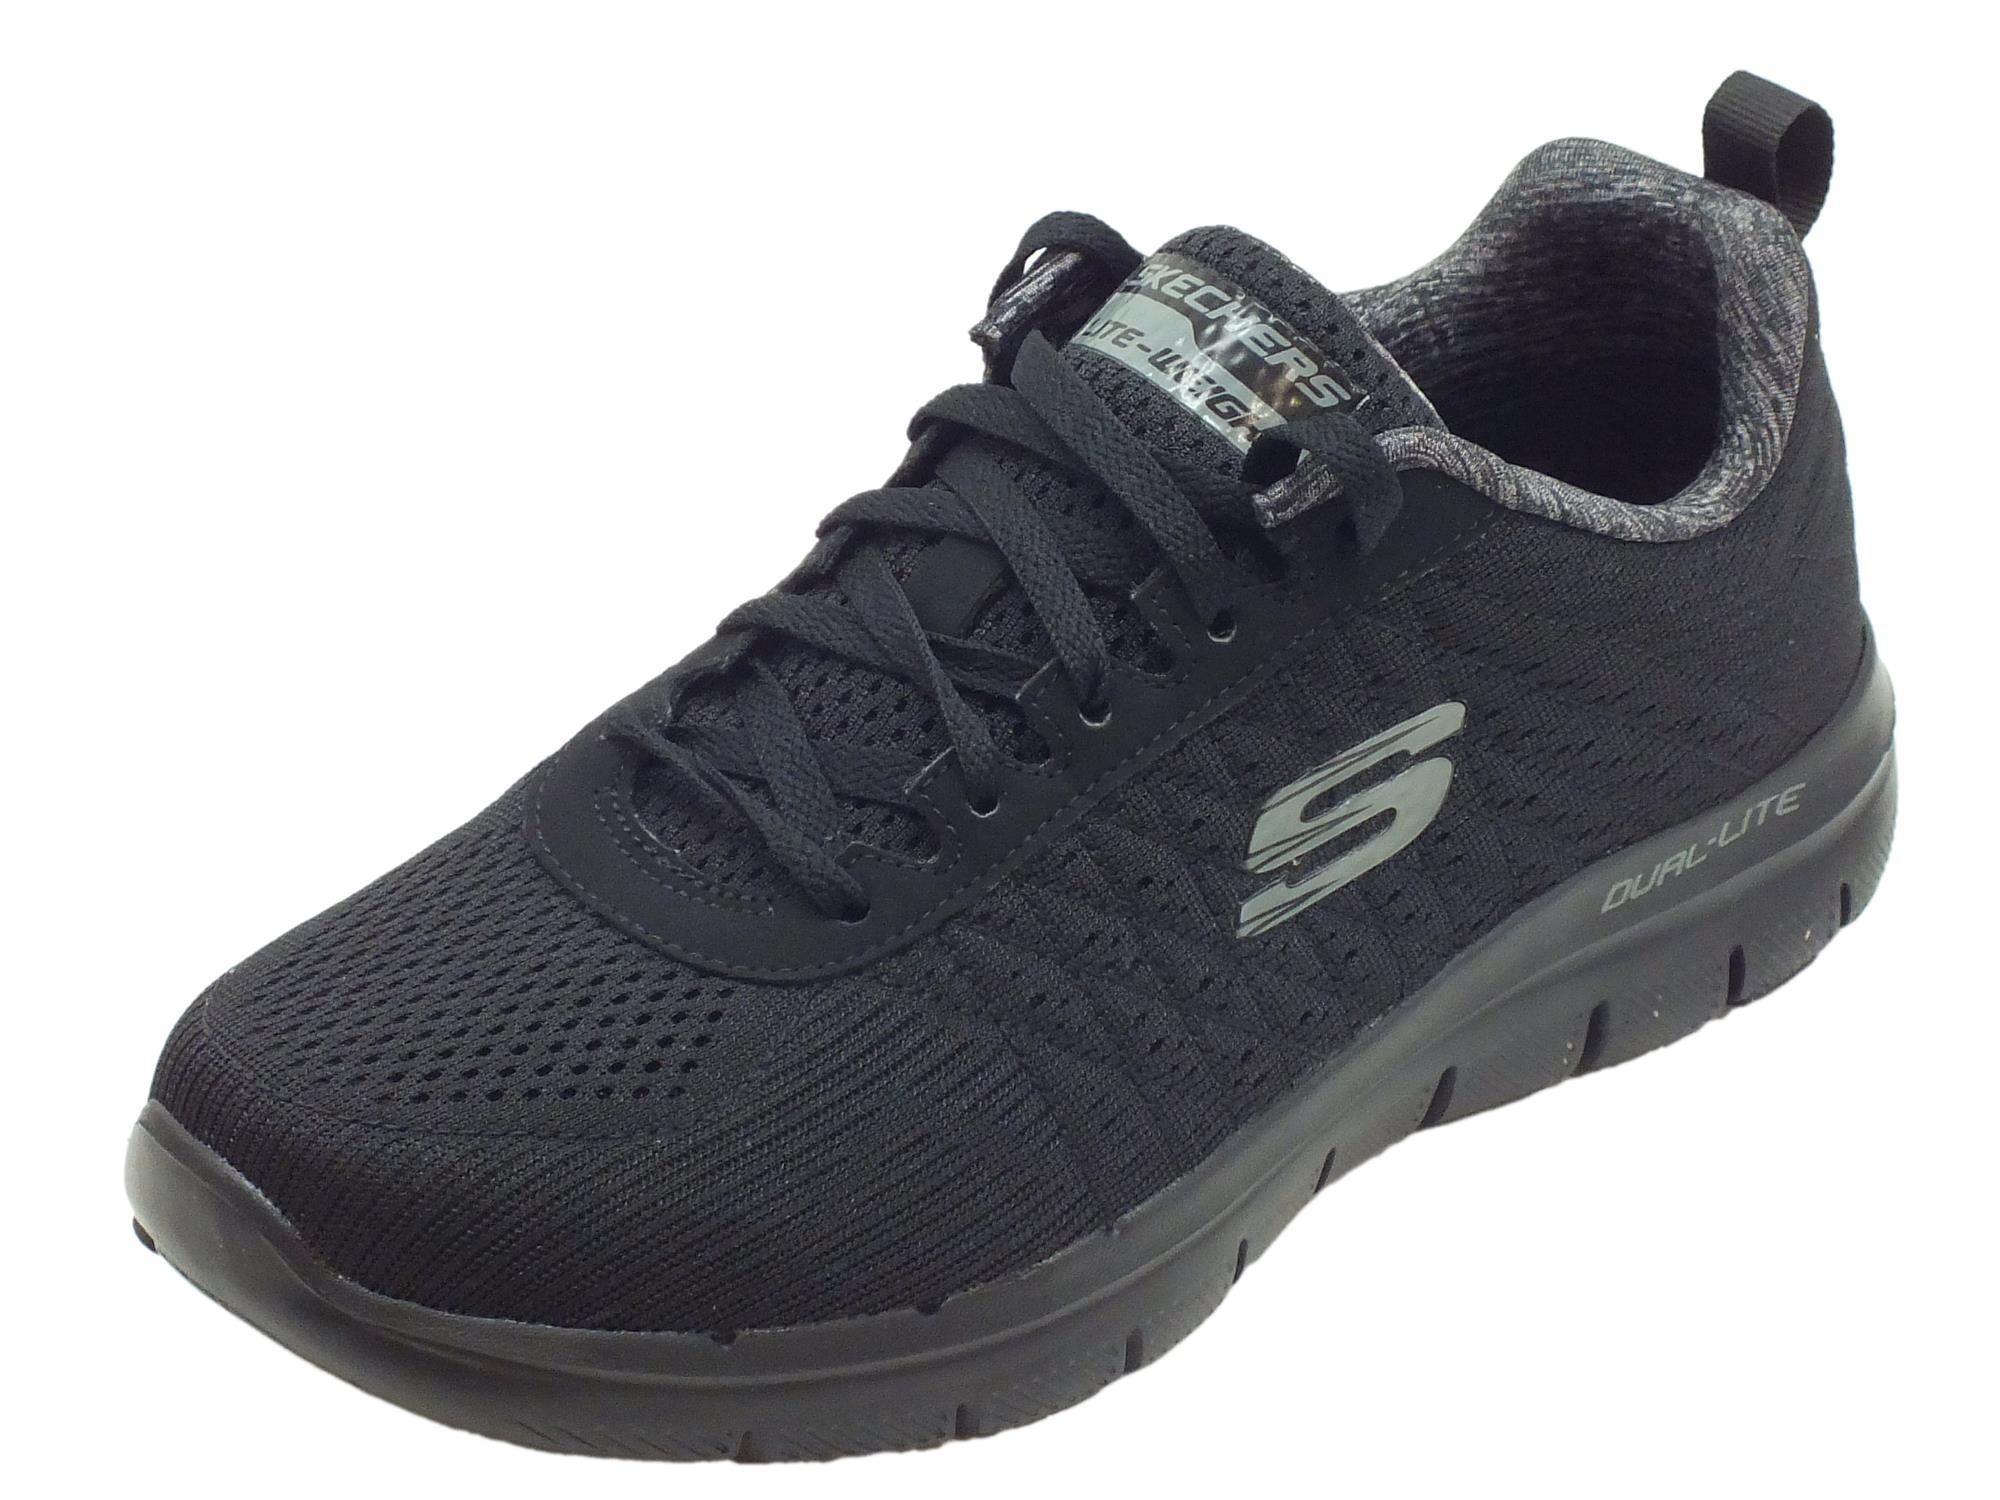 scarpe skechers memory foam uomo prezzi Sale,up to 65 ...